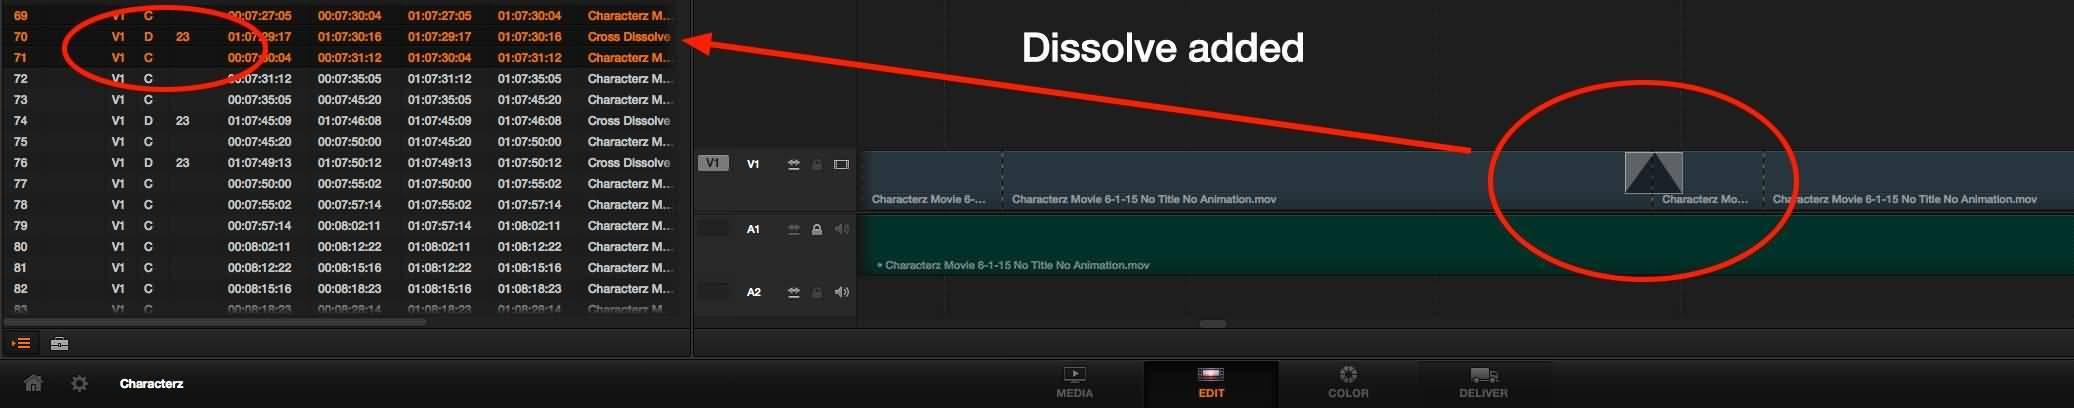 davinci-resolve-dissolve